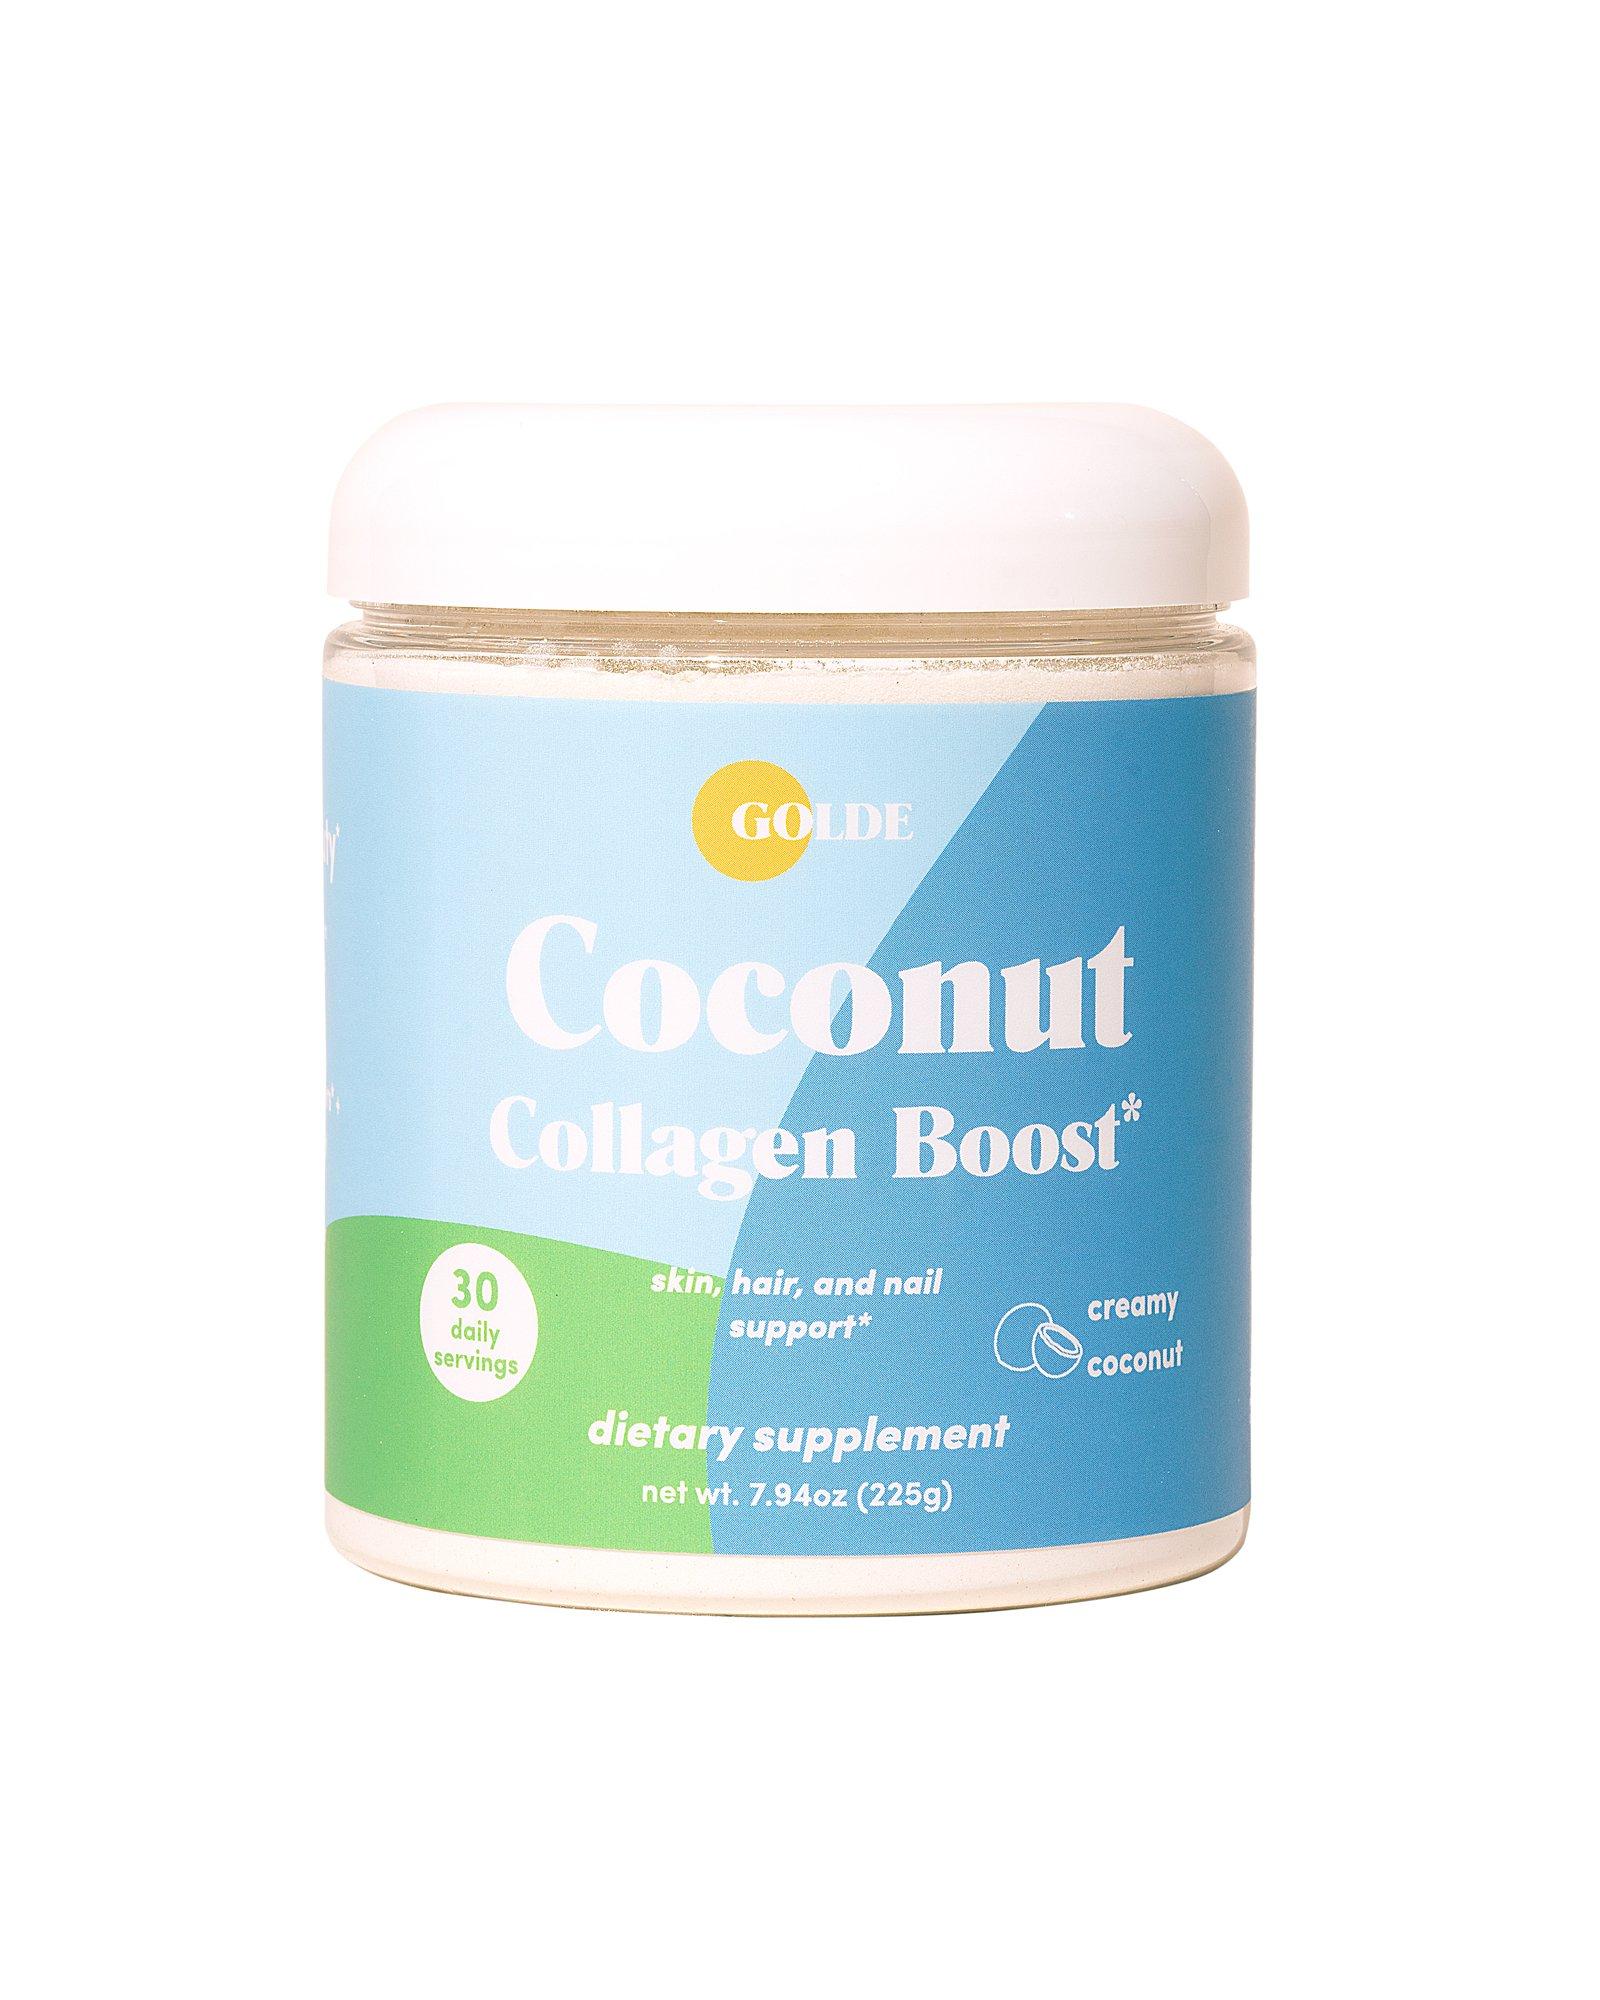 Coconut Collagen Boost